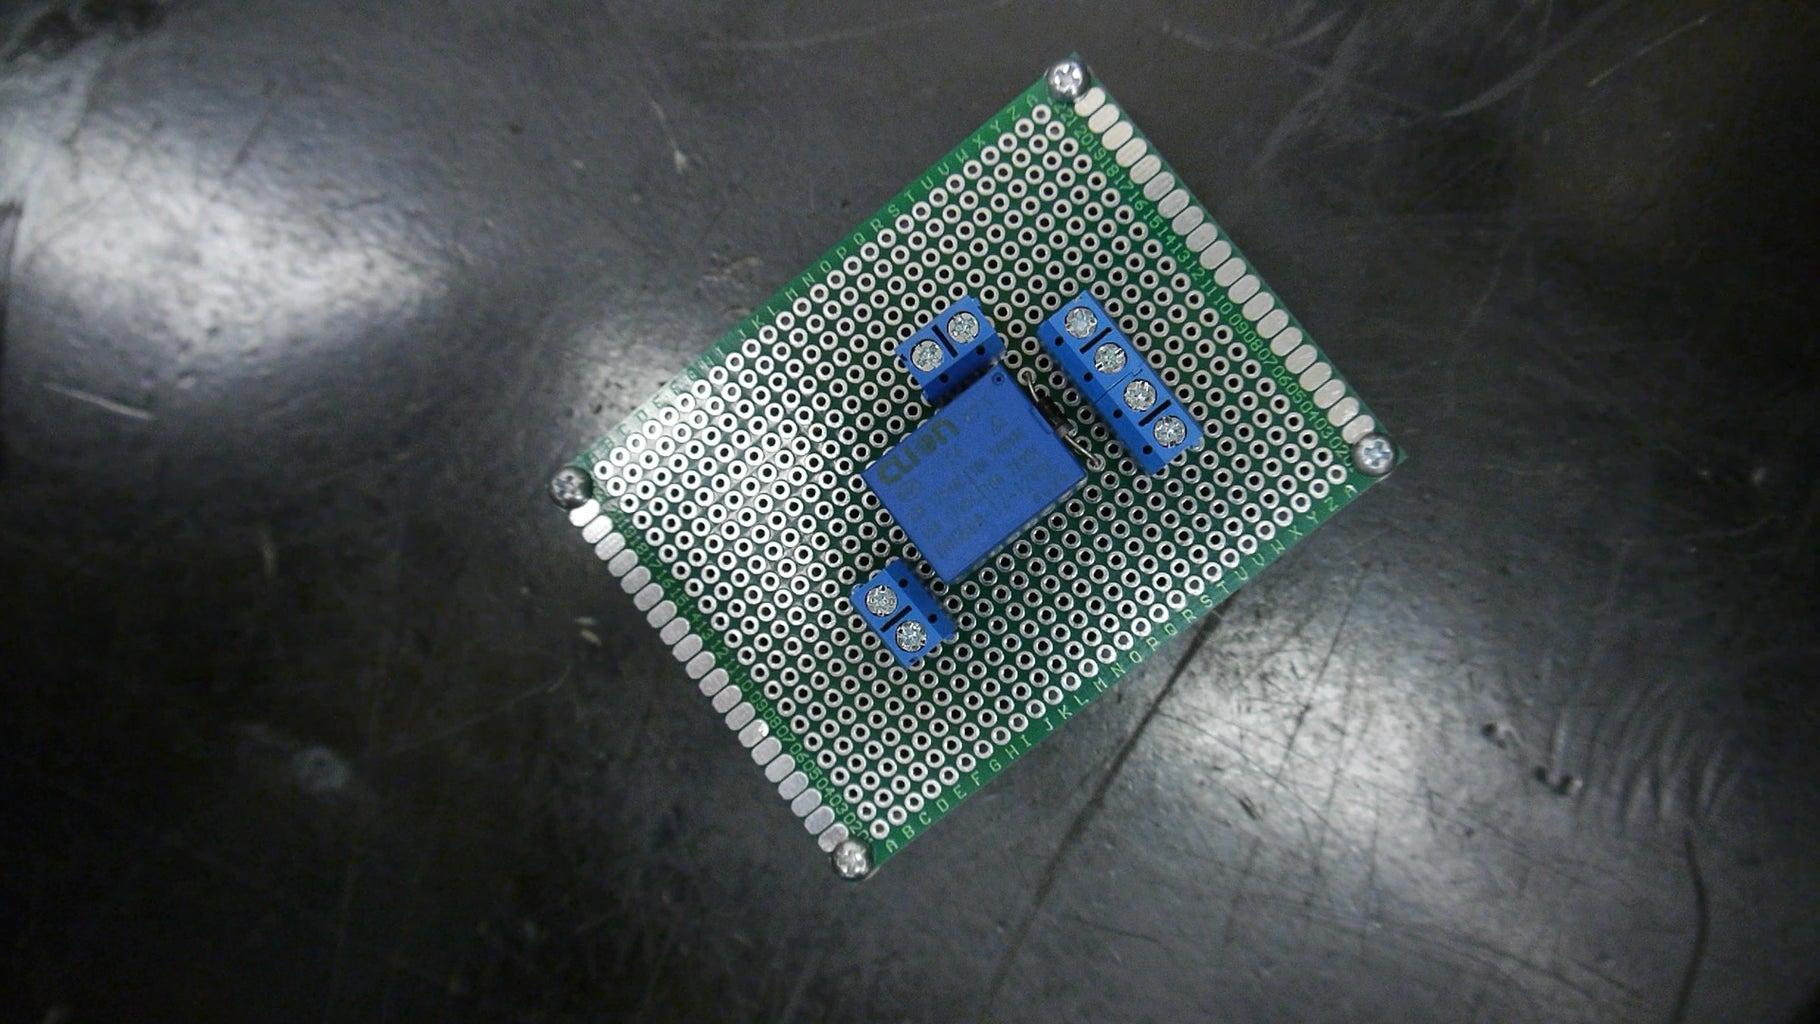 Assembling the Circuit Board